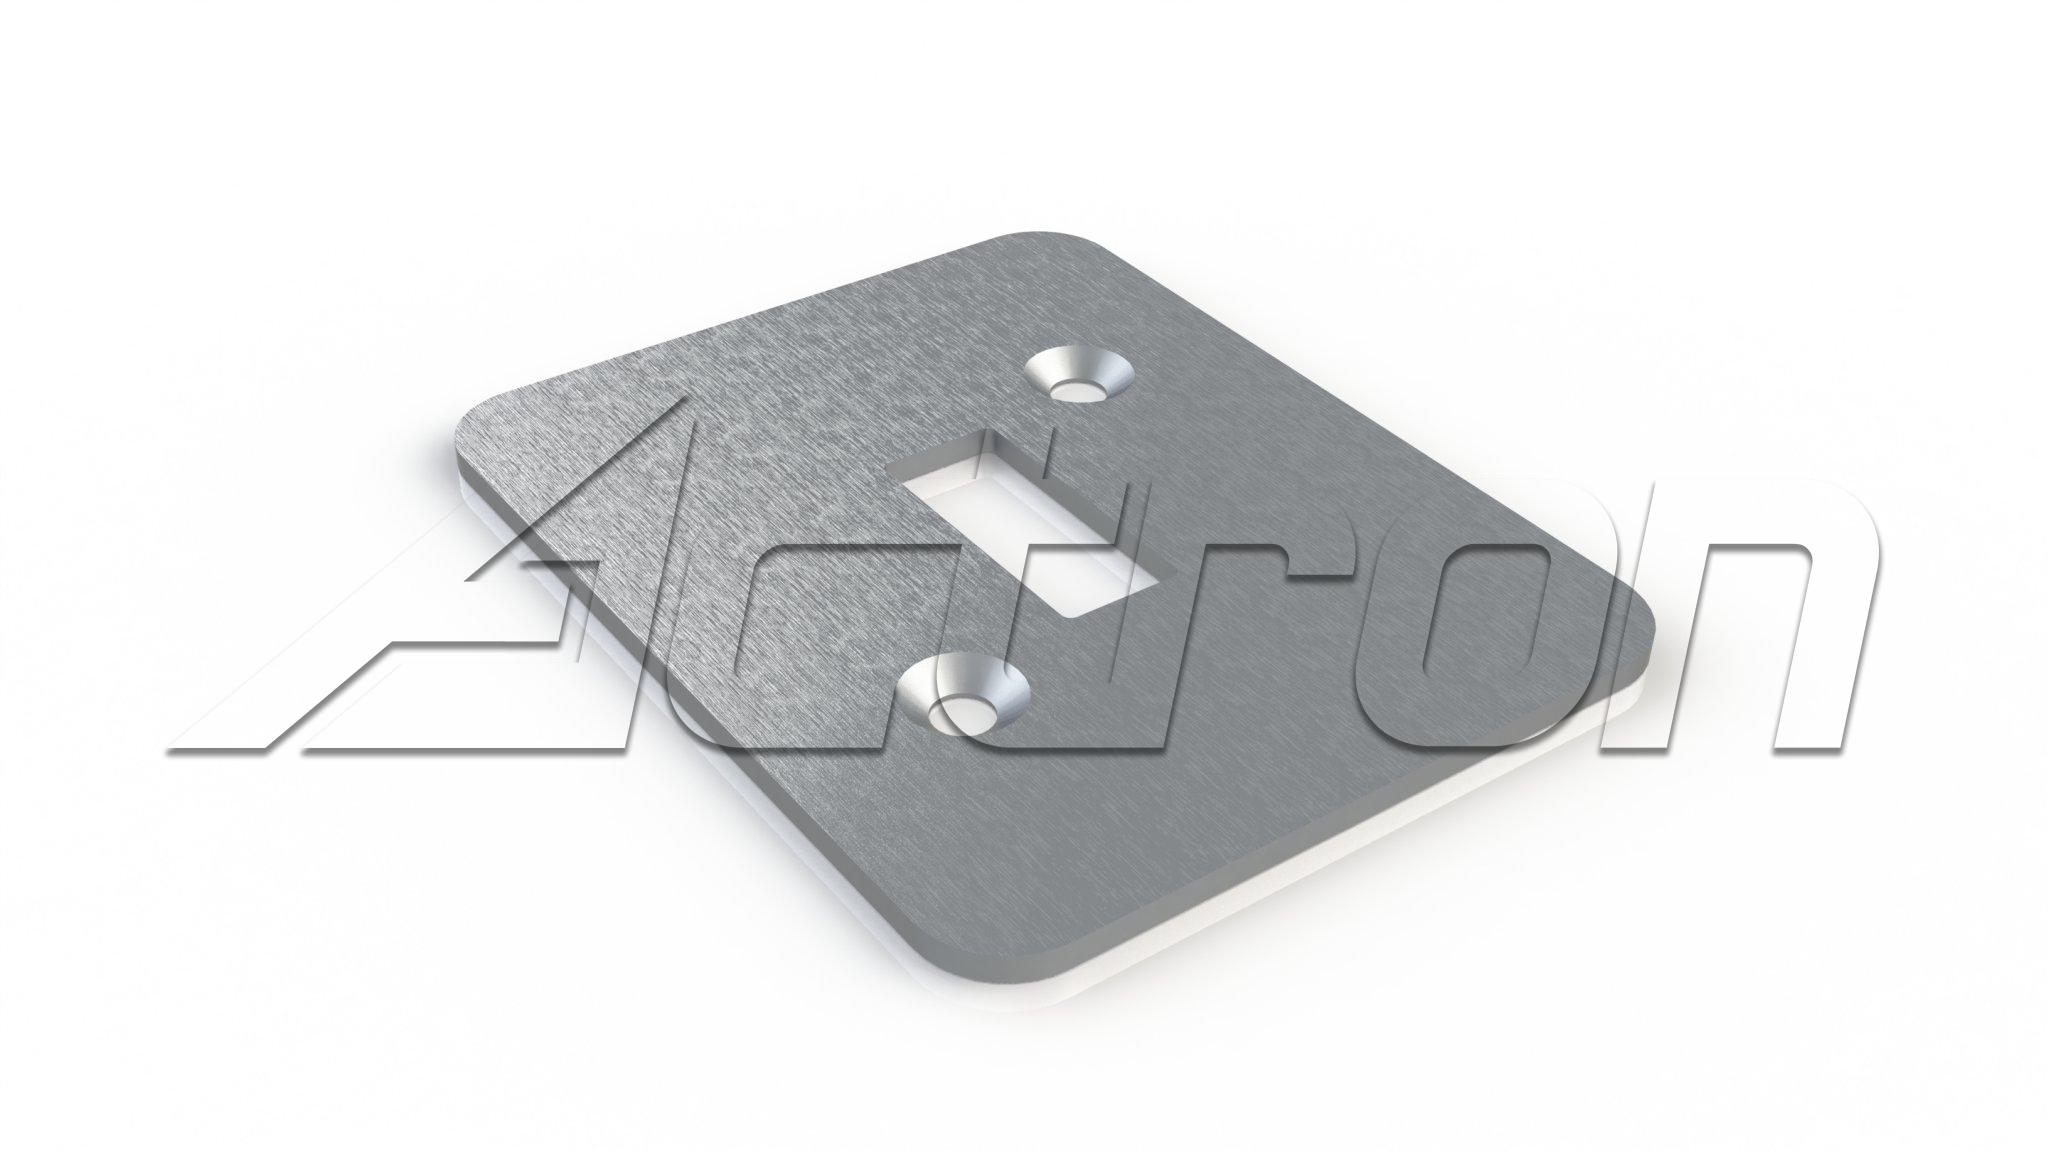 mounting-plate-8211-latch-5278-a43010.jpg